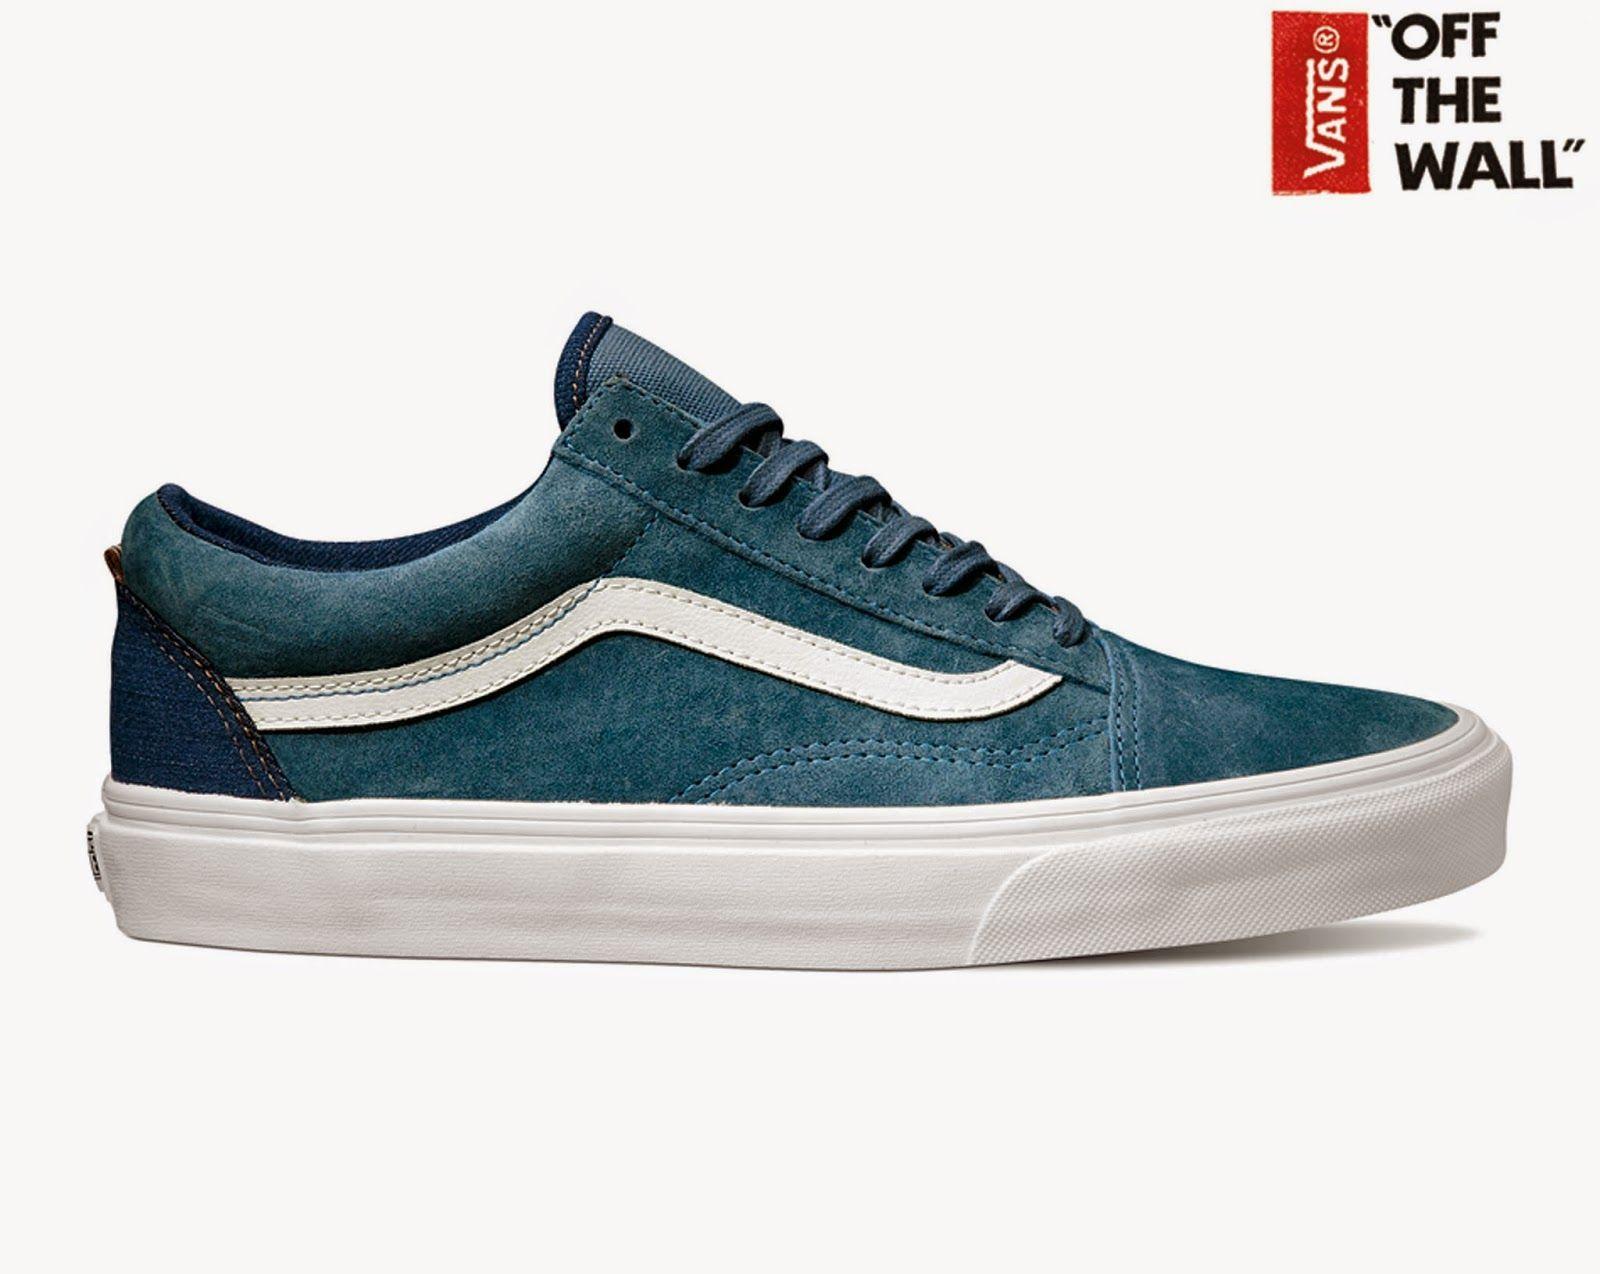 Vans, the Original #ClassicSideStripe #PaulVanDoren, #SportsFootwear, #Vans, #VansSidestripe http://pocketnewsalert.blogspot.in/2015/02/Vans-the-Original-Classic-Side-Stripe.html